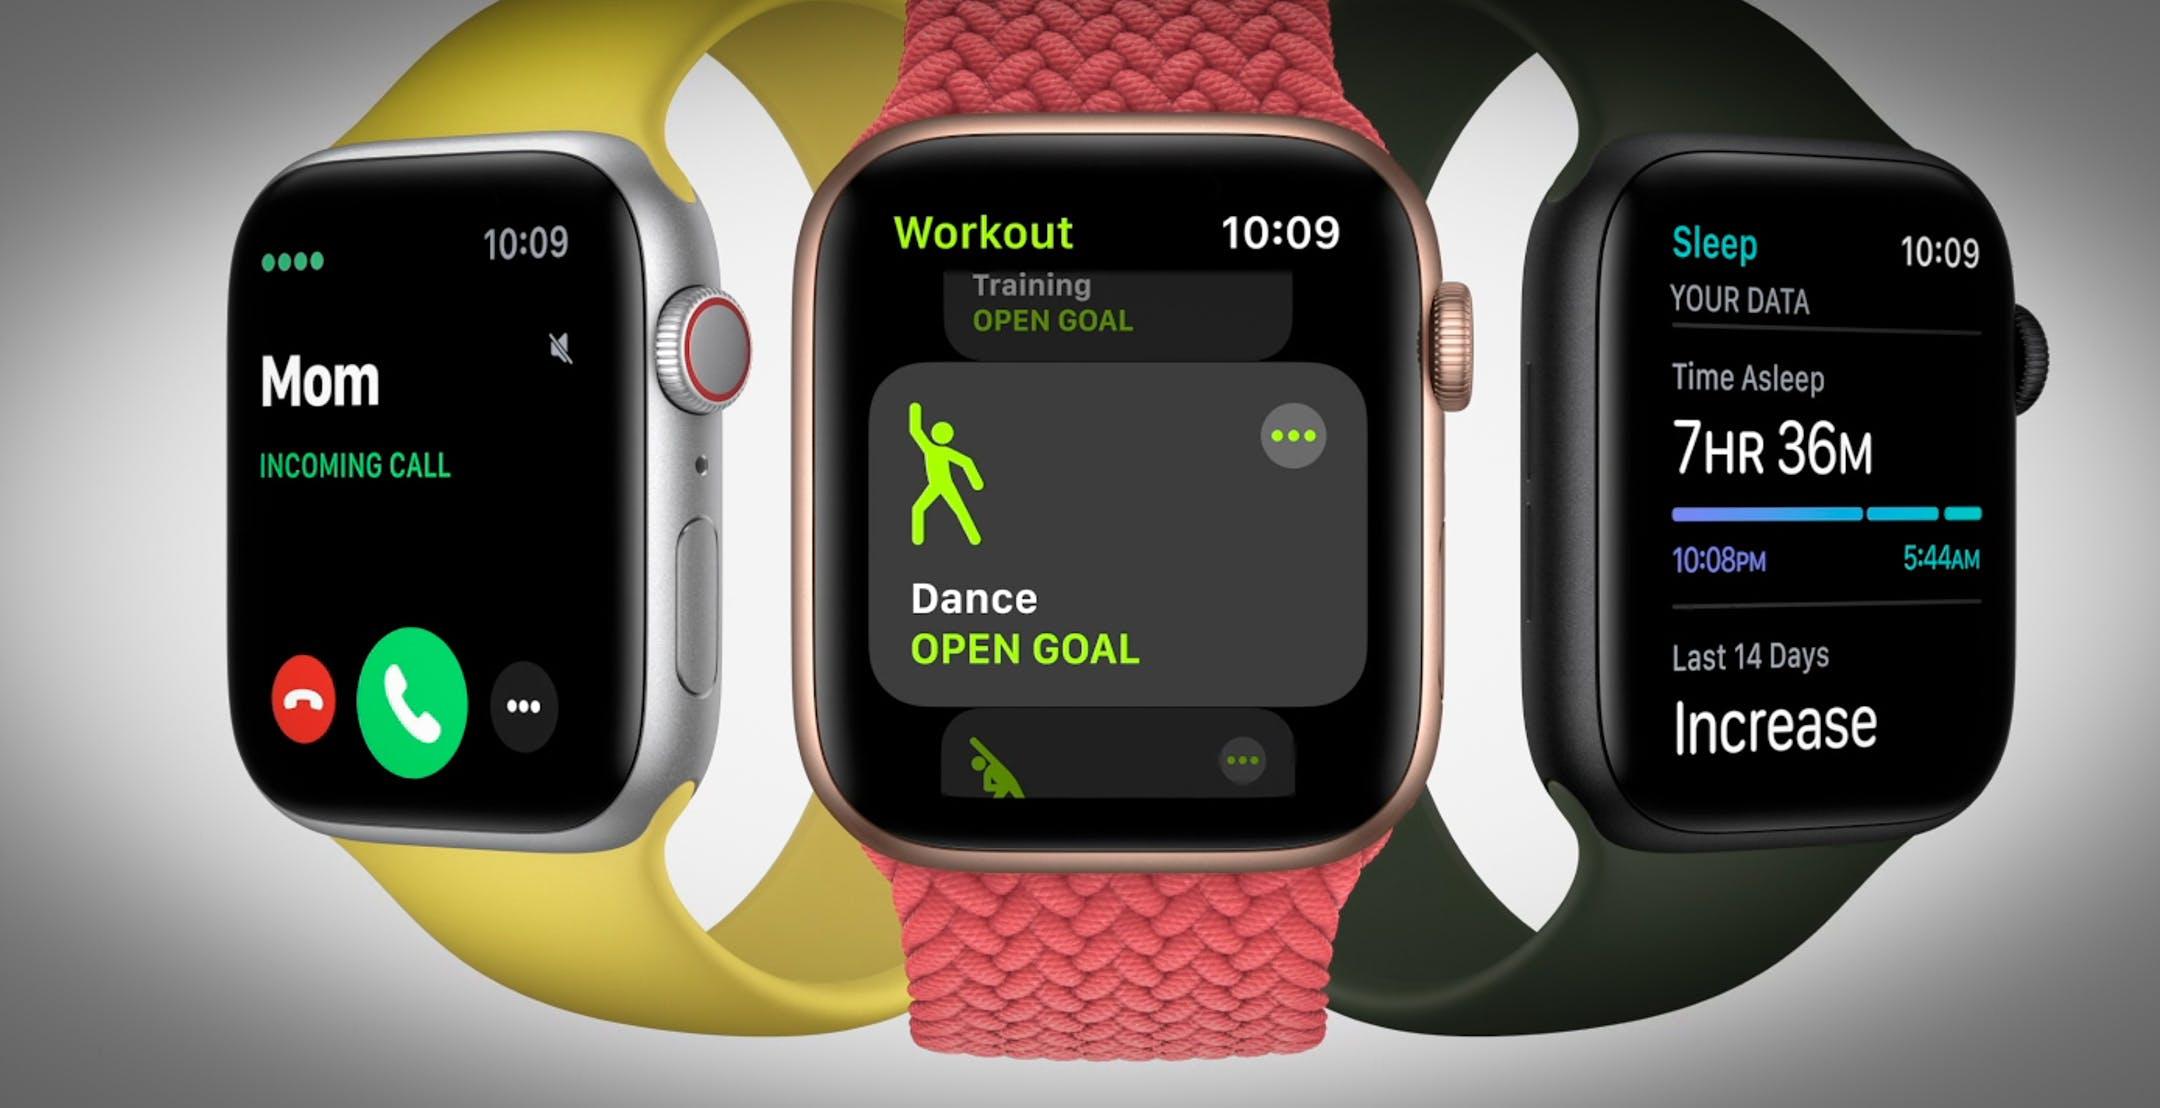 Apple Watch si stacca da iPhone: con Watch SE e Family Setup Apple punta a bambini e anziani